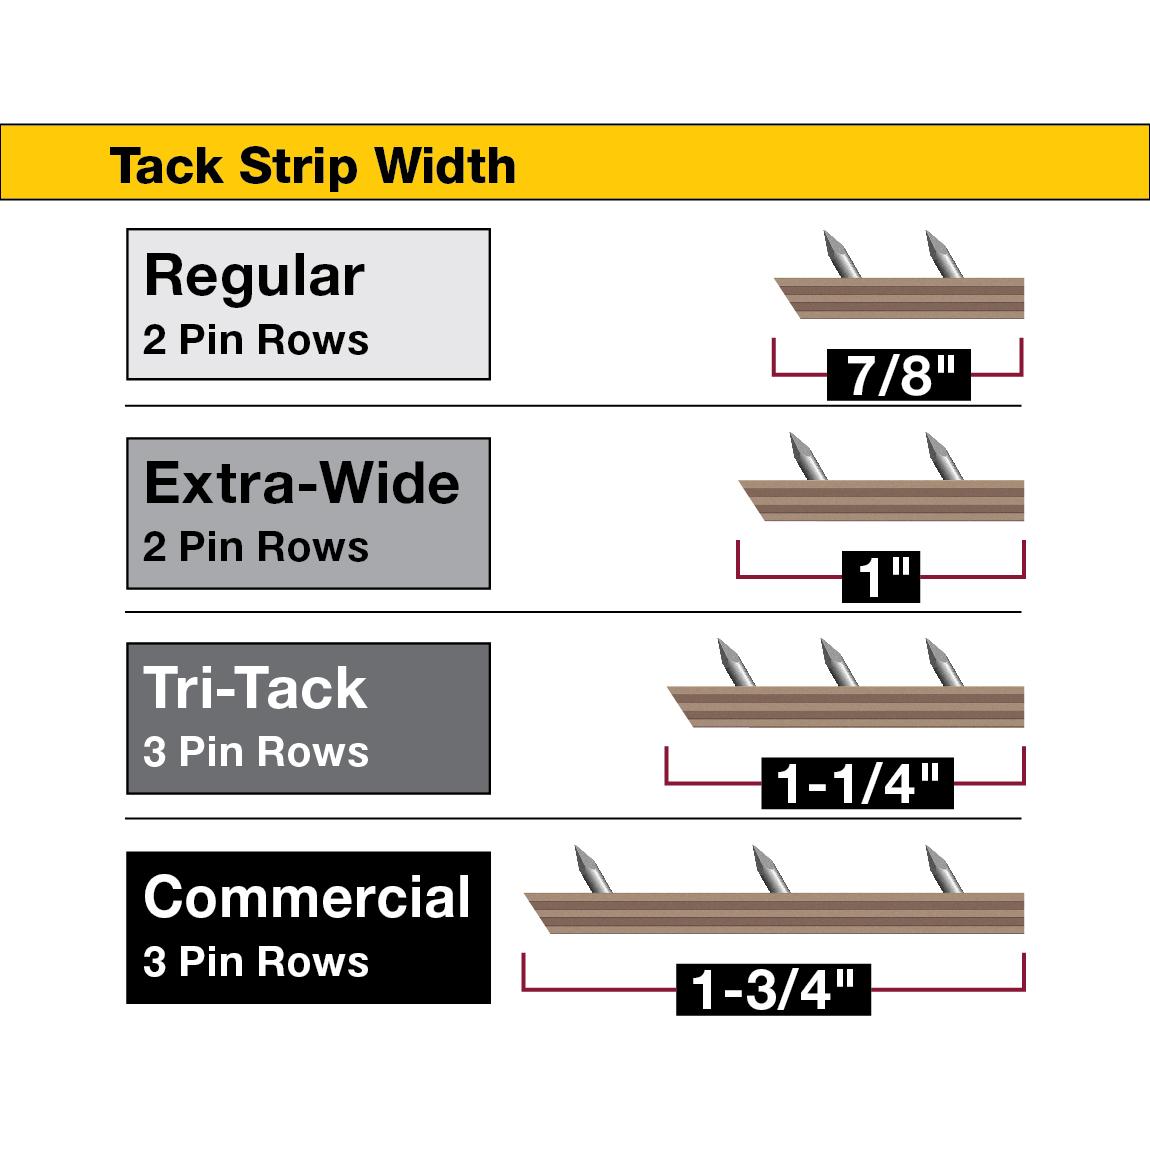 Peel & Stick Tack Strip - Roberts